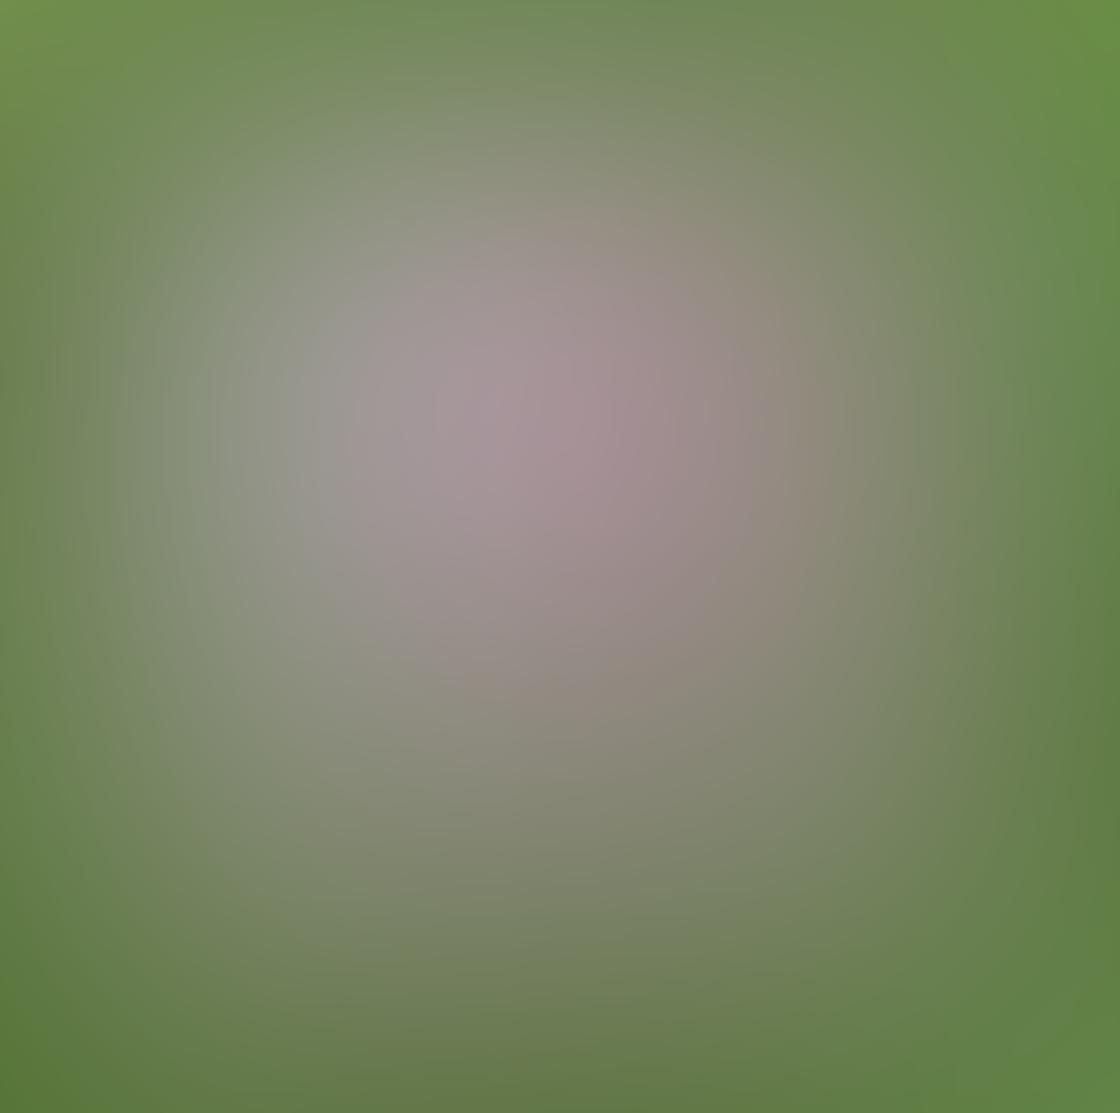 iPhone Ollocase Olloclip Active Lens 27